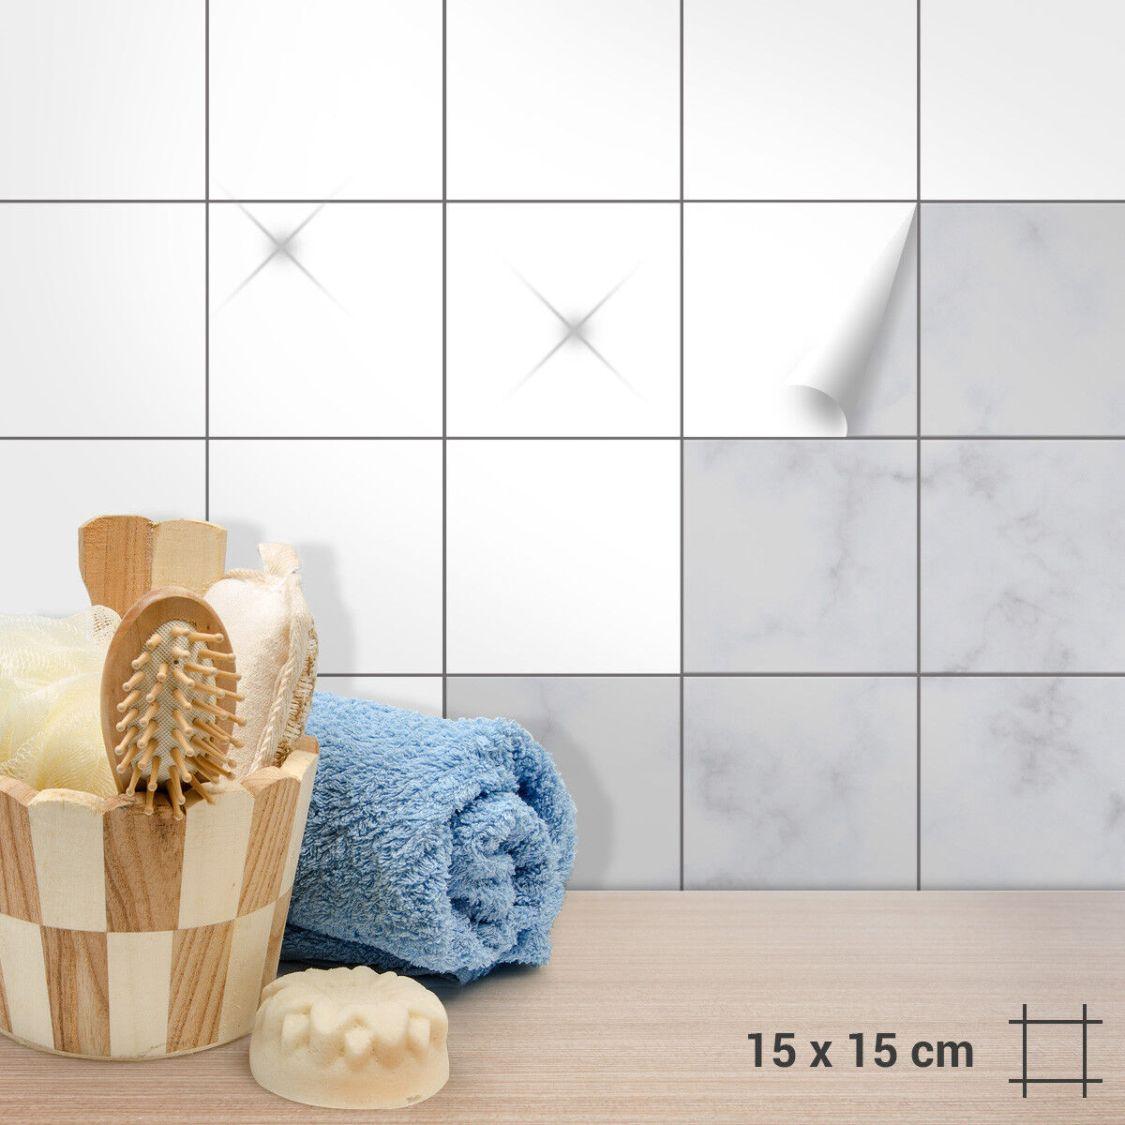 Fliesenaufkleber 15 x 15 cm Weiß Matt Glänzend Küche Badezimmer Bad Aufkleber